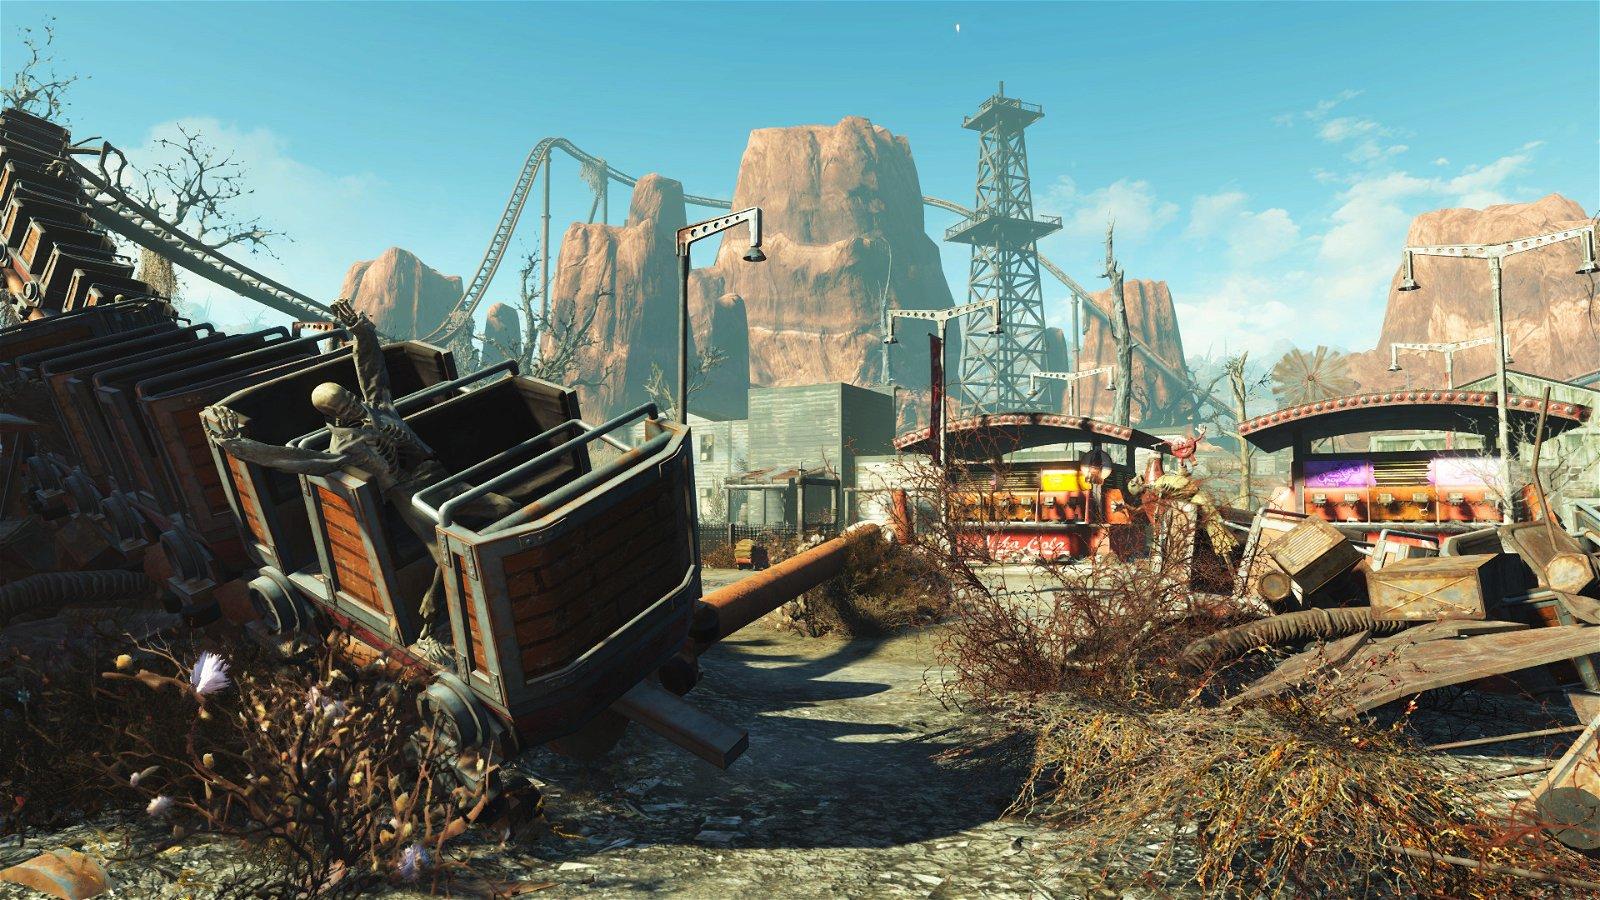 Fallout 4: Nuka-World Dlc (Ps4) Review 3